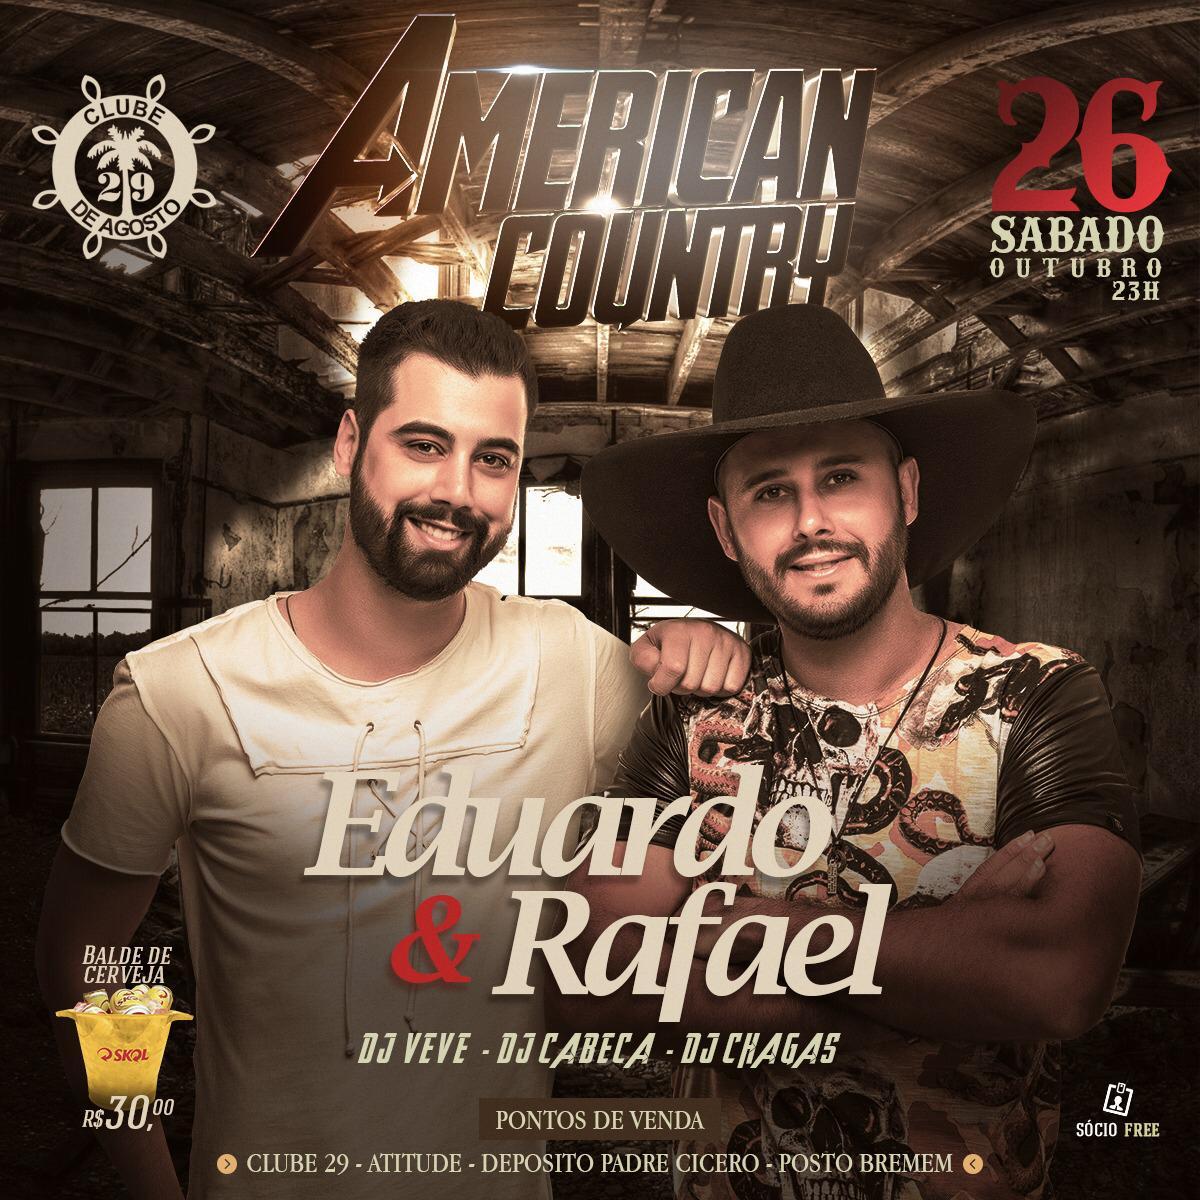 Eduardo & Rafael - 26/10/19 - Leme - SP